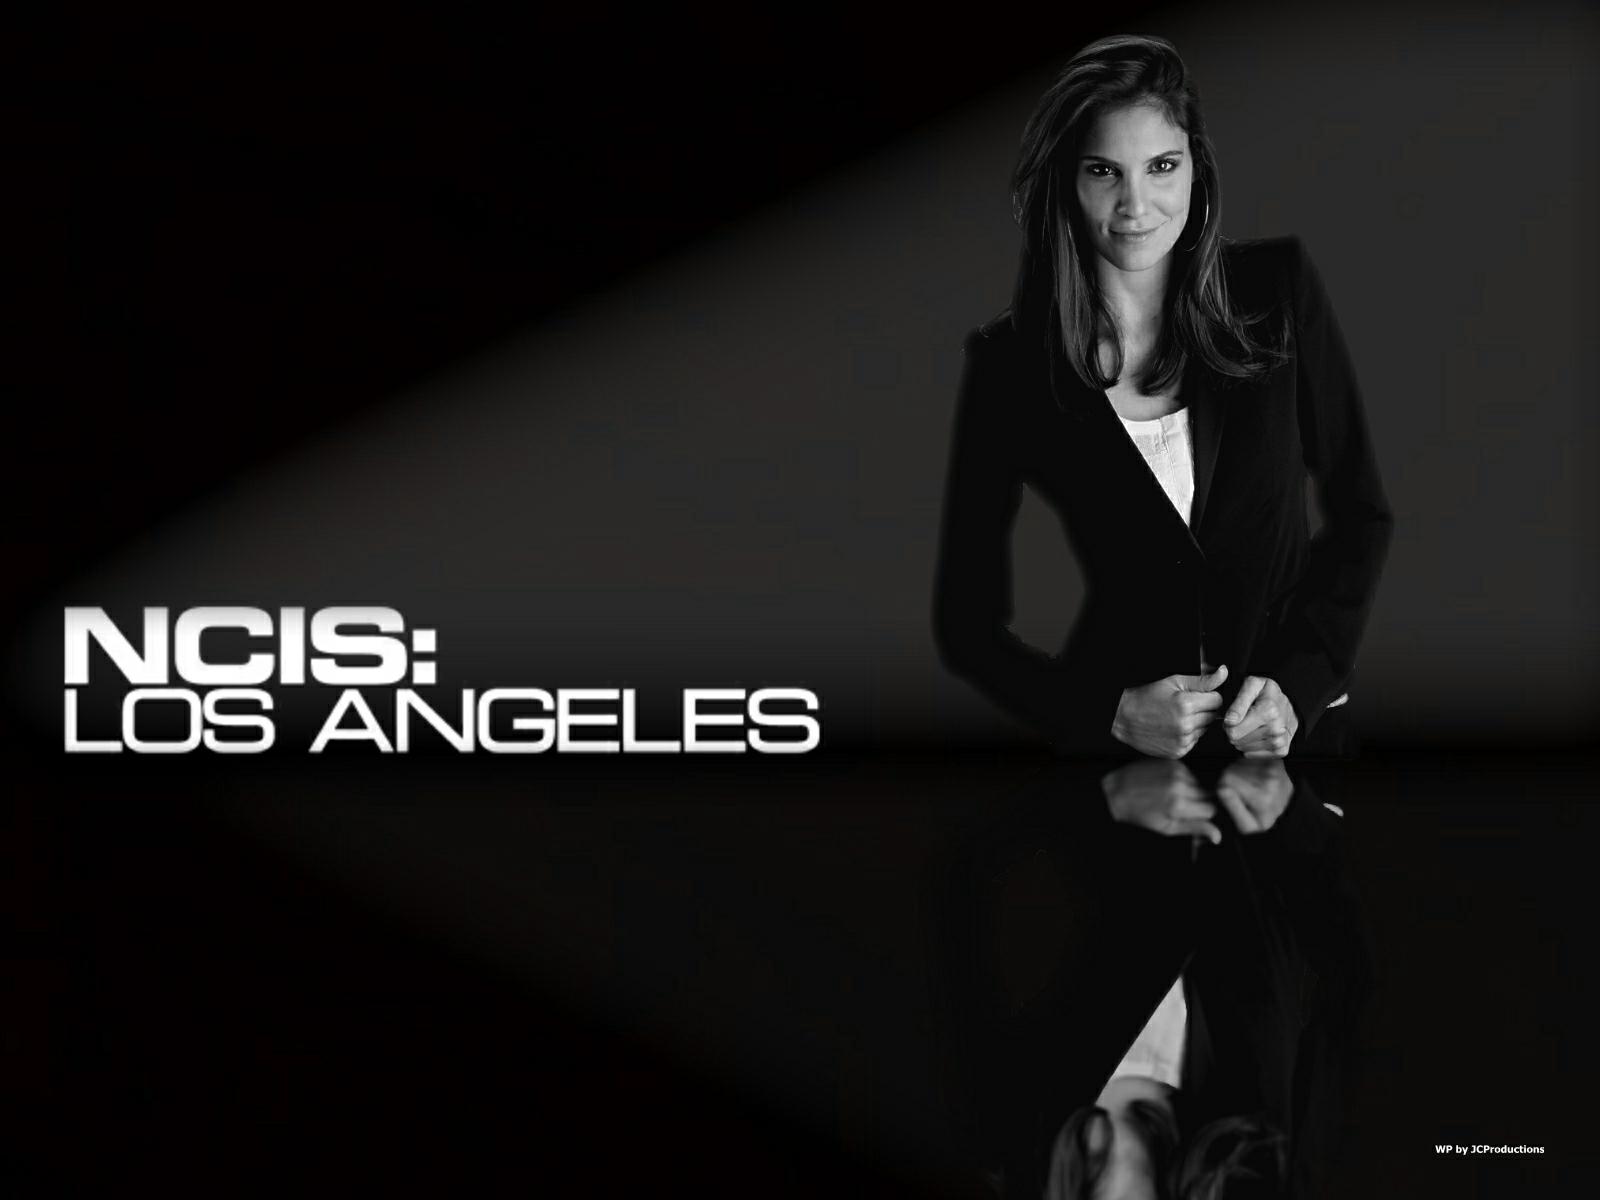 Download High quality ncis: los angeles, kensi blye, kensi, cbs, daniela ruah, daniela, spies, sexy, babes NCIS Los Angeles wallpaper / 1600x1200